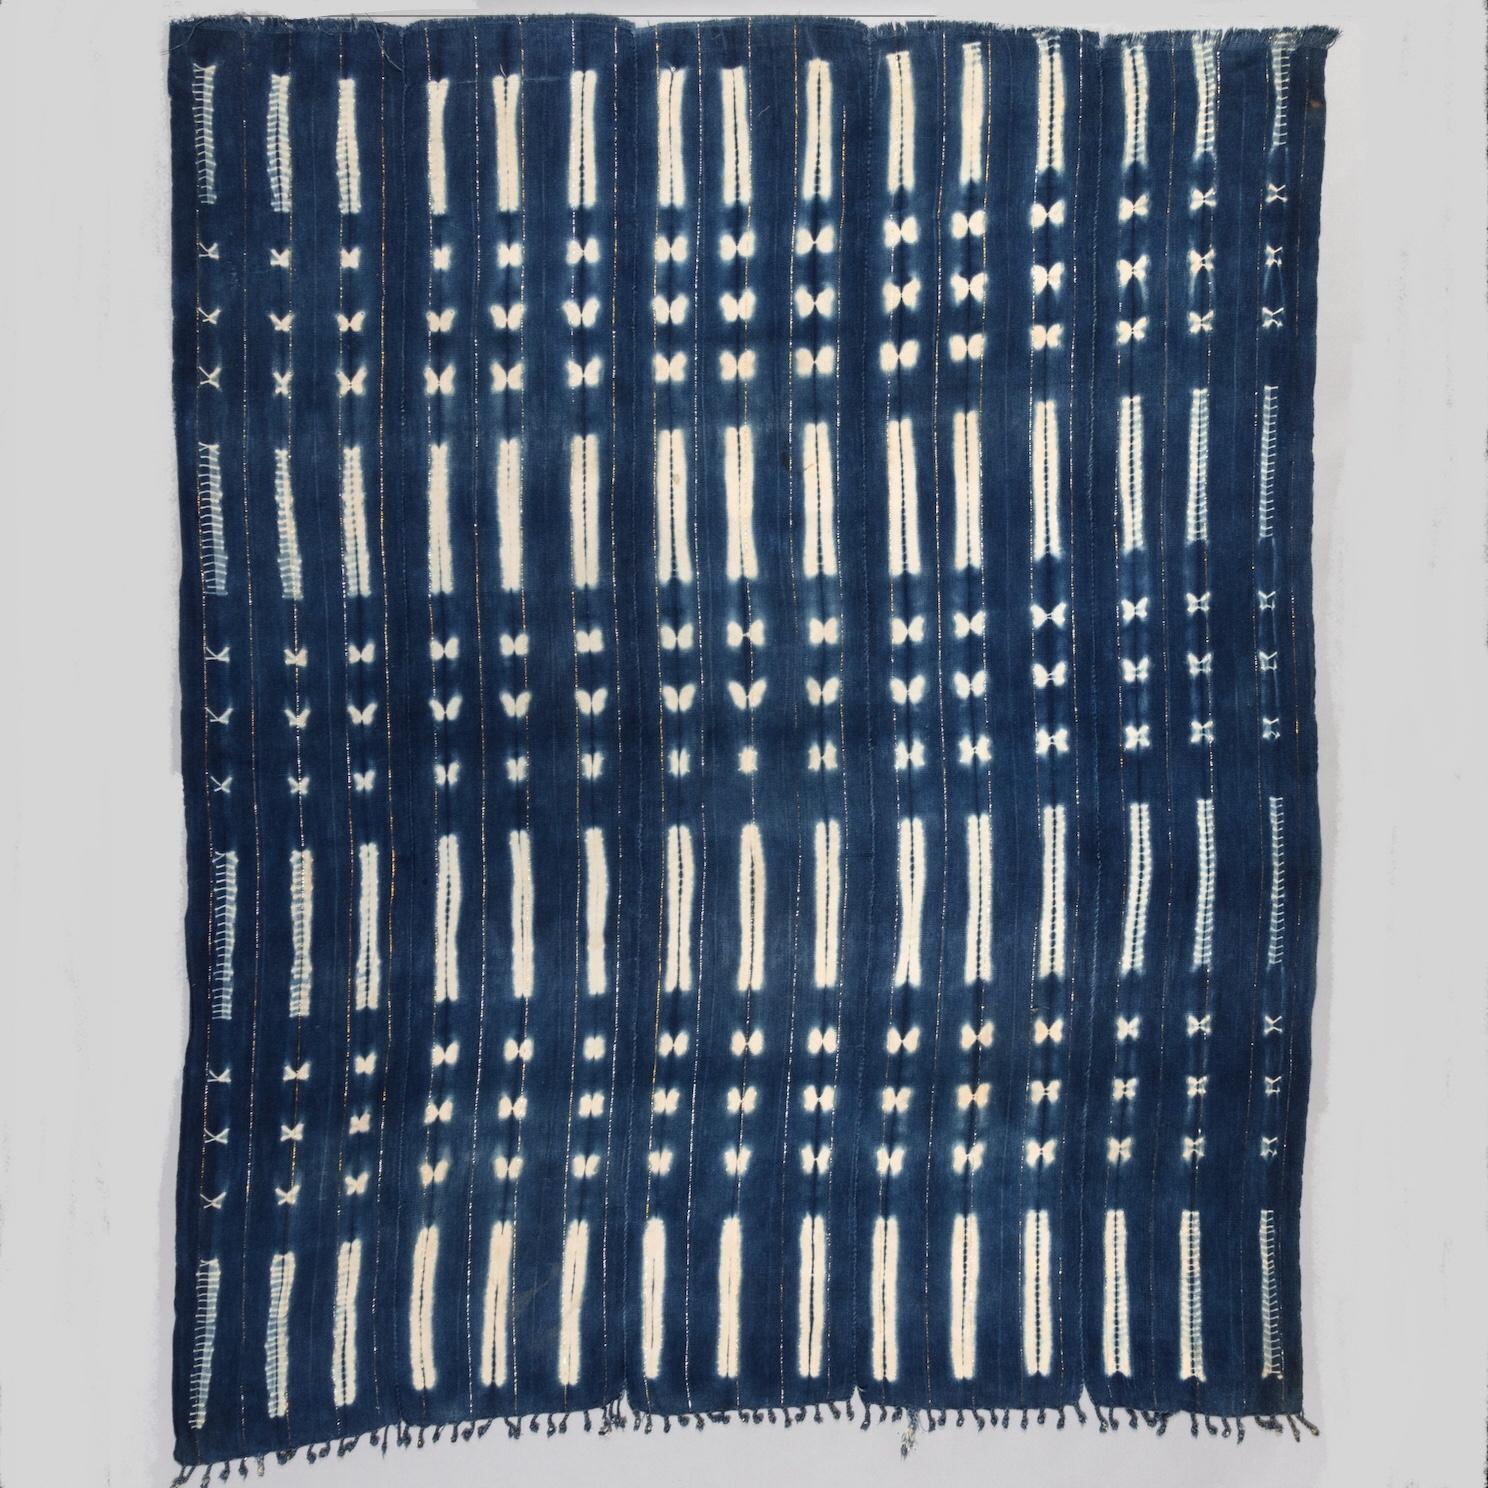 A POWERFUL CLOTH, MOSSI TRIBE BURKINA FASO ( No 3484 )